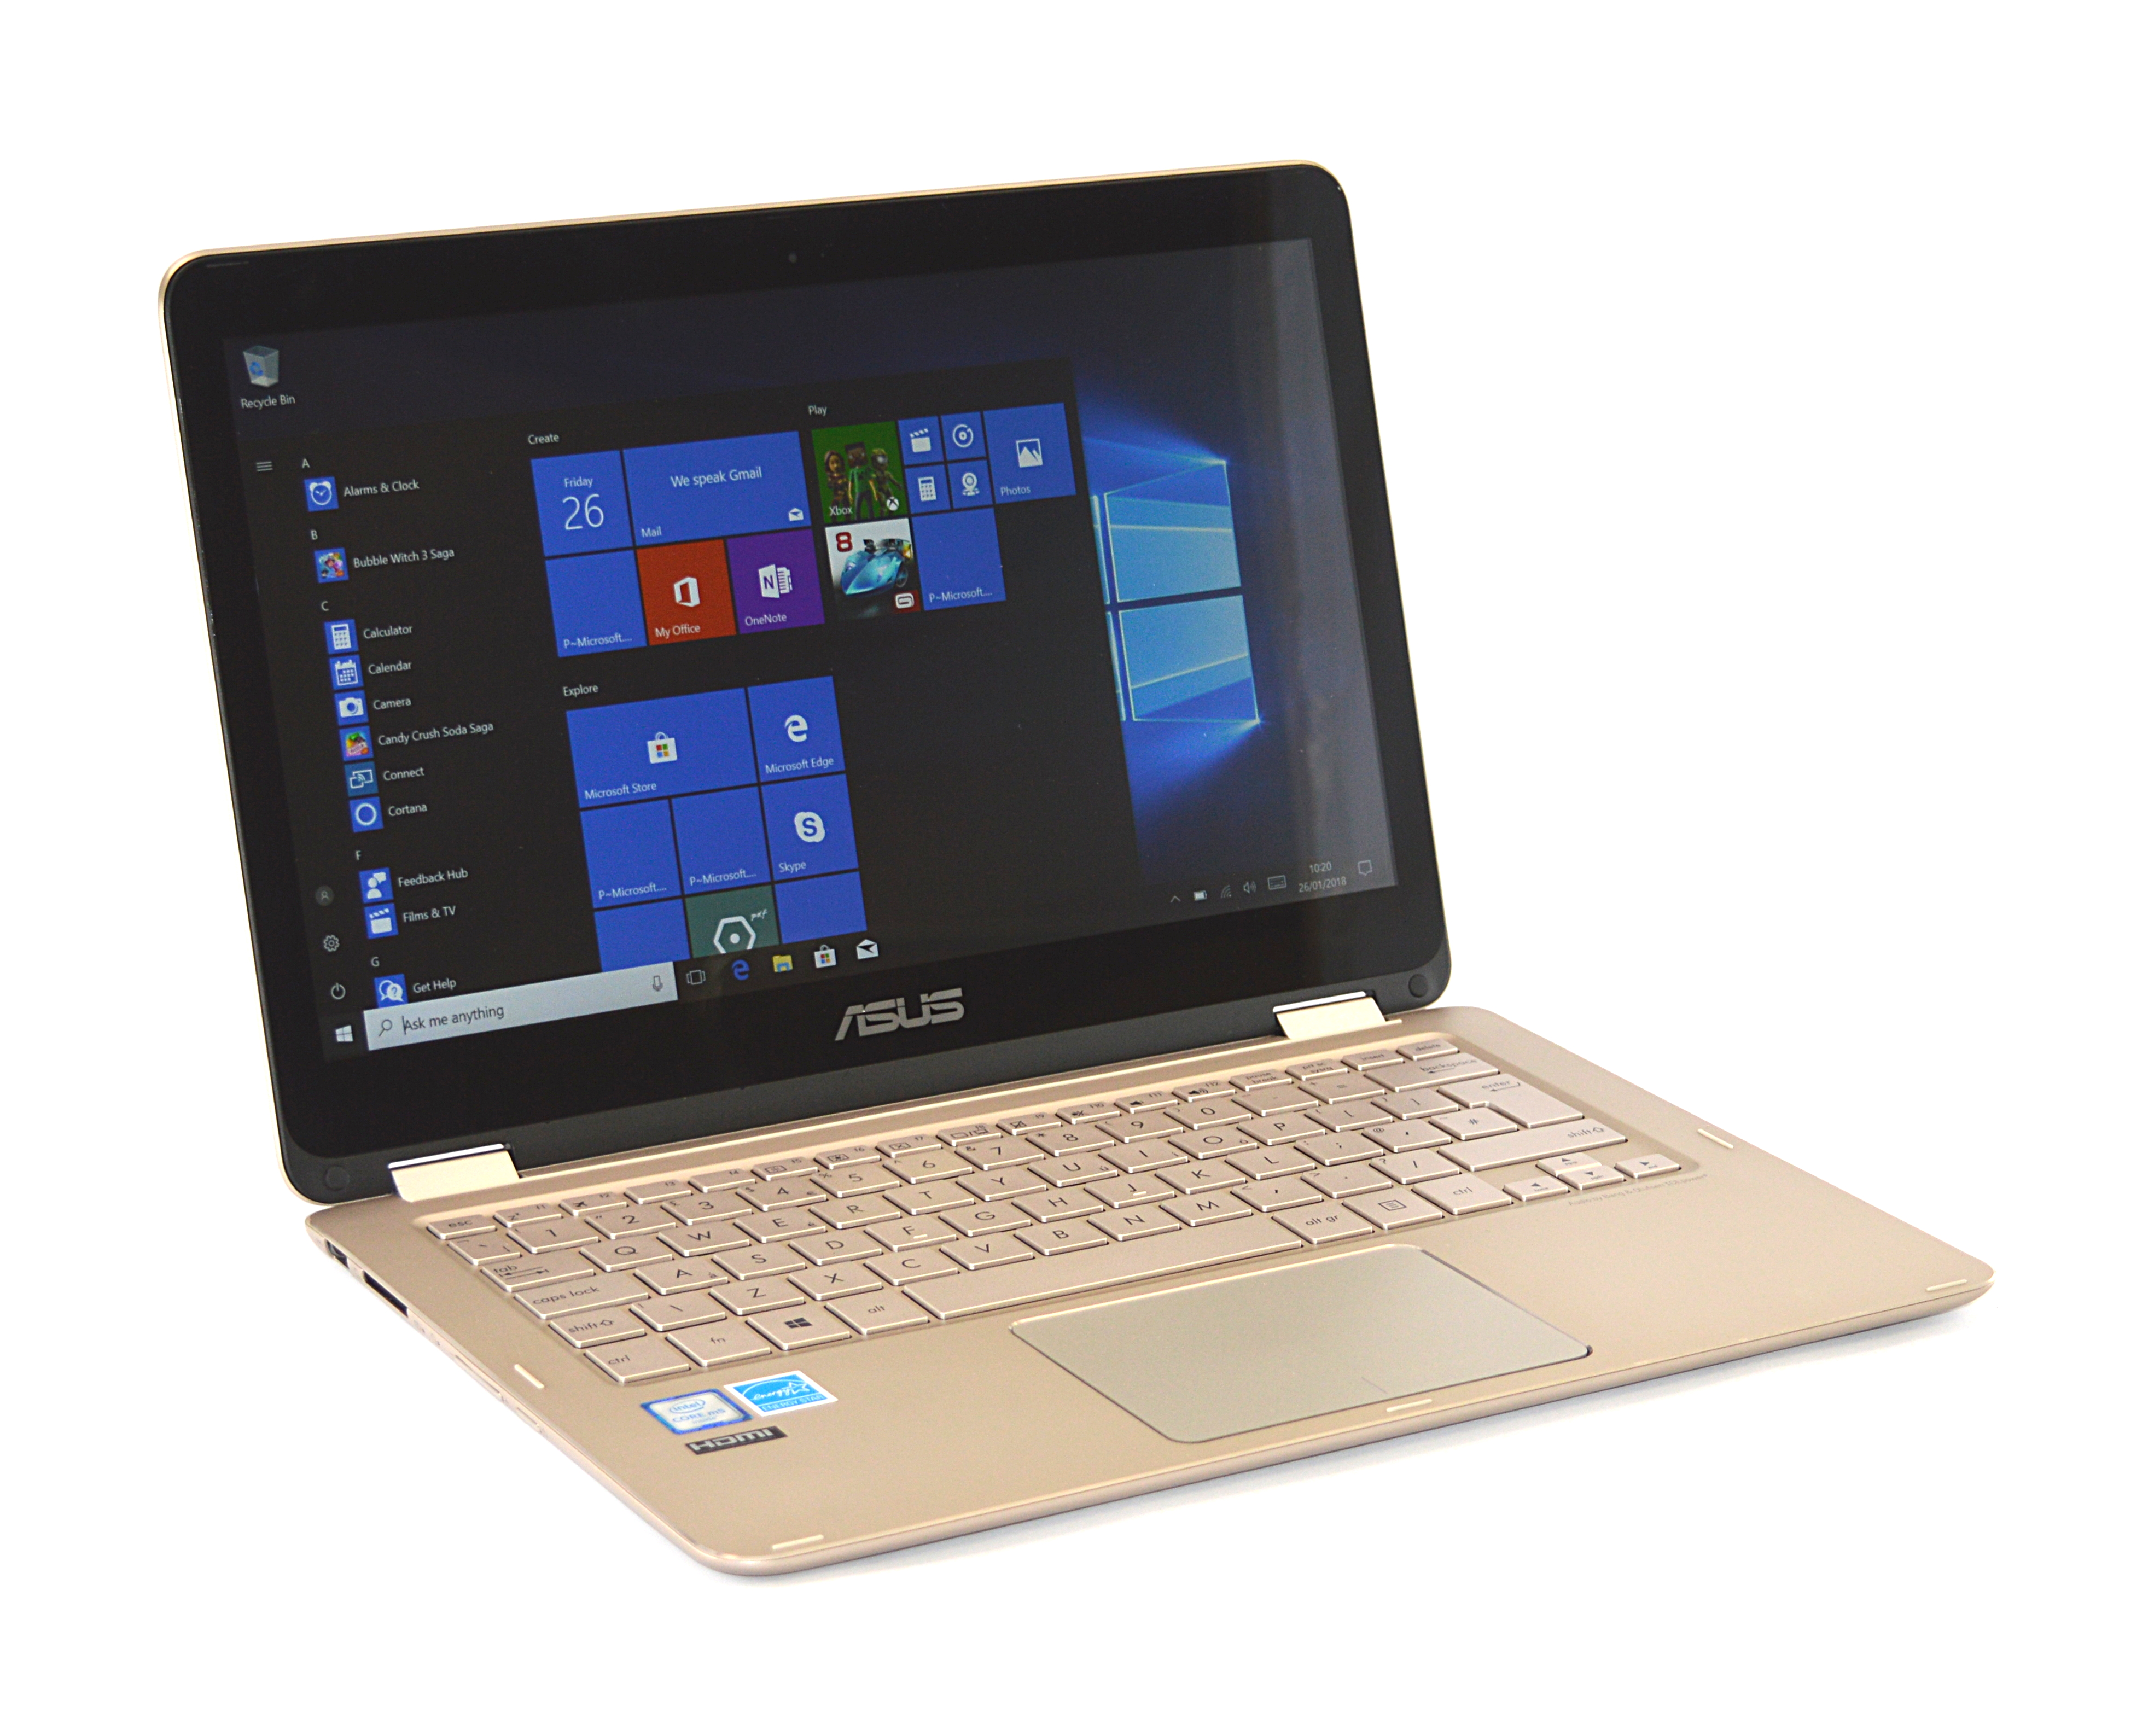 "Asus ZenBook Flip UX360C Laptop Core m5-6Y54 8GB RAM 256GB SSD 13.3"" Win 10"